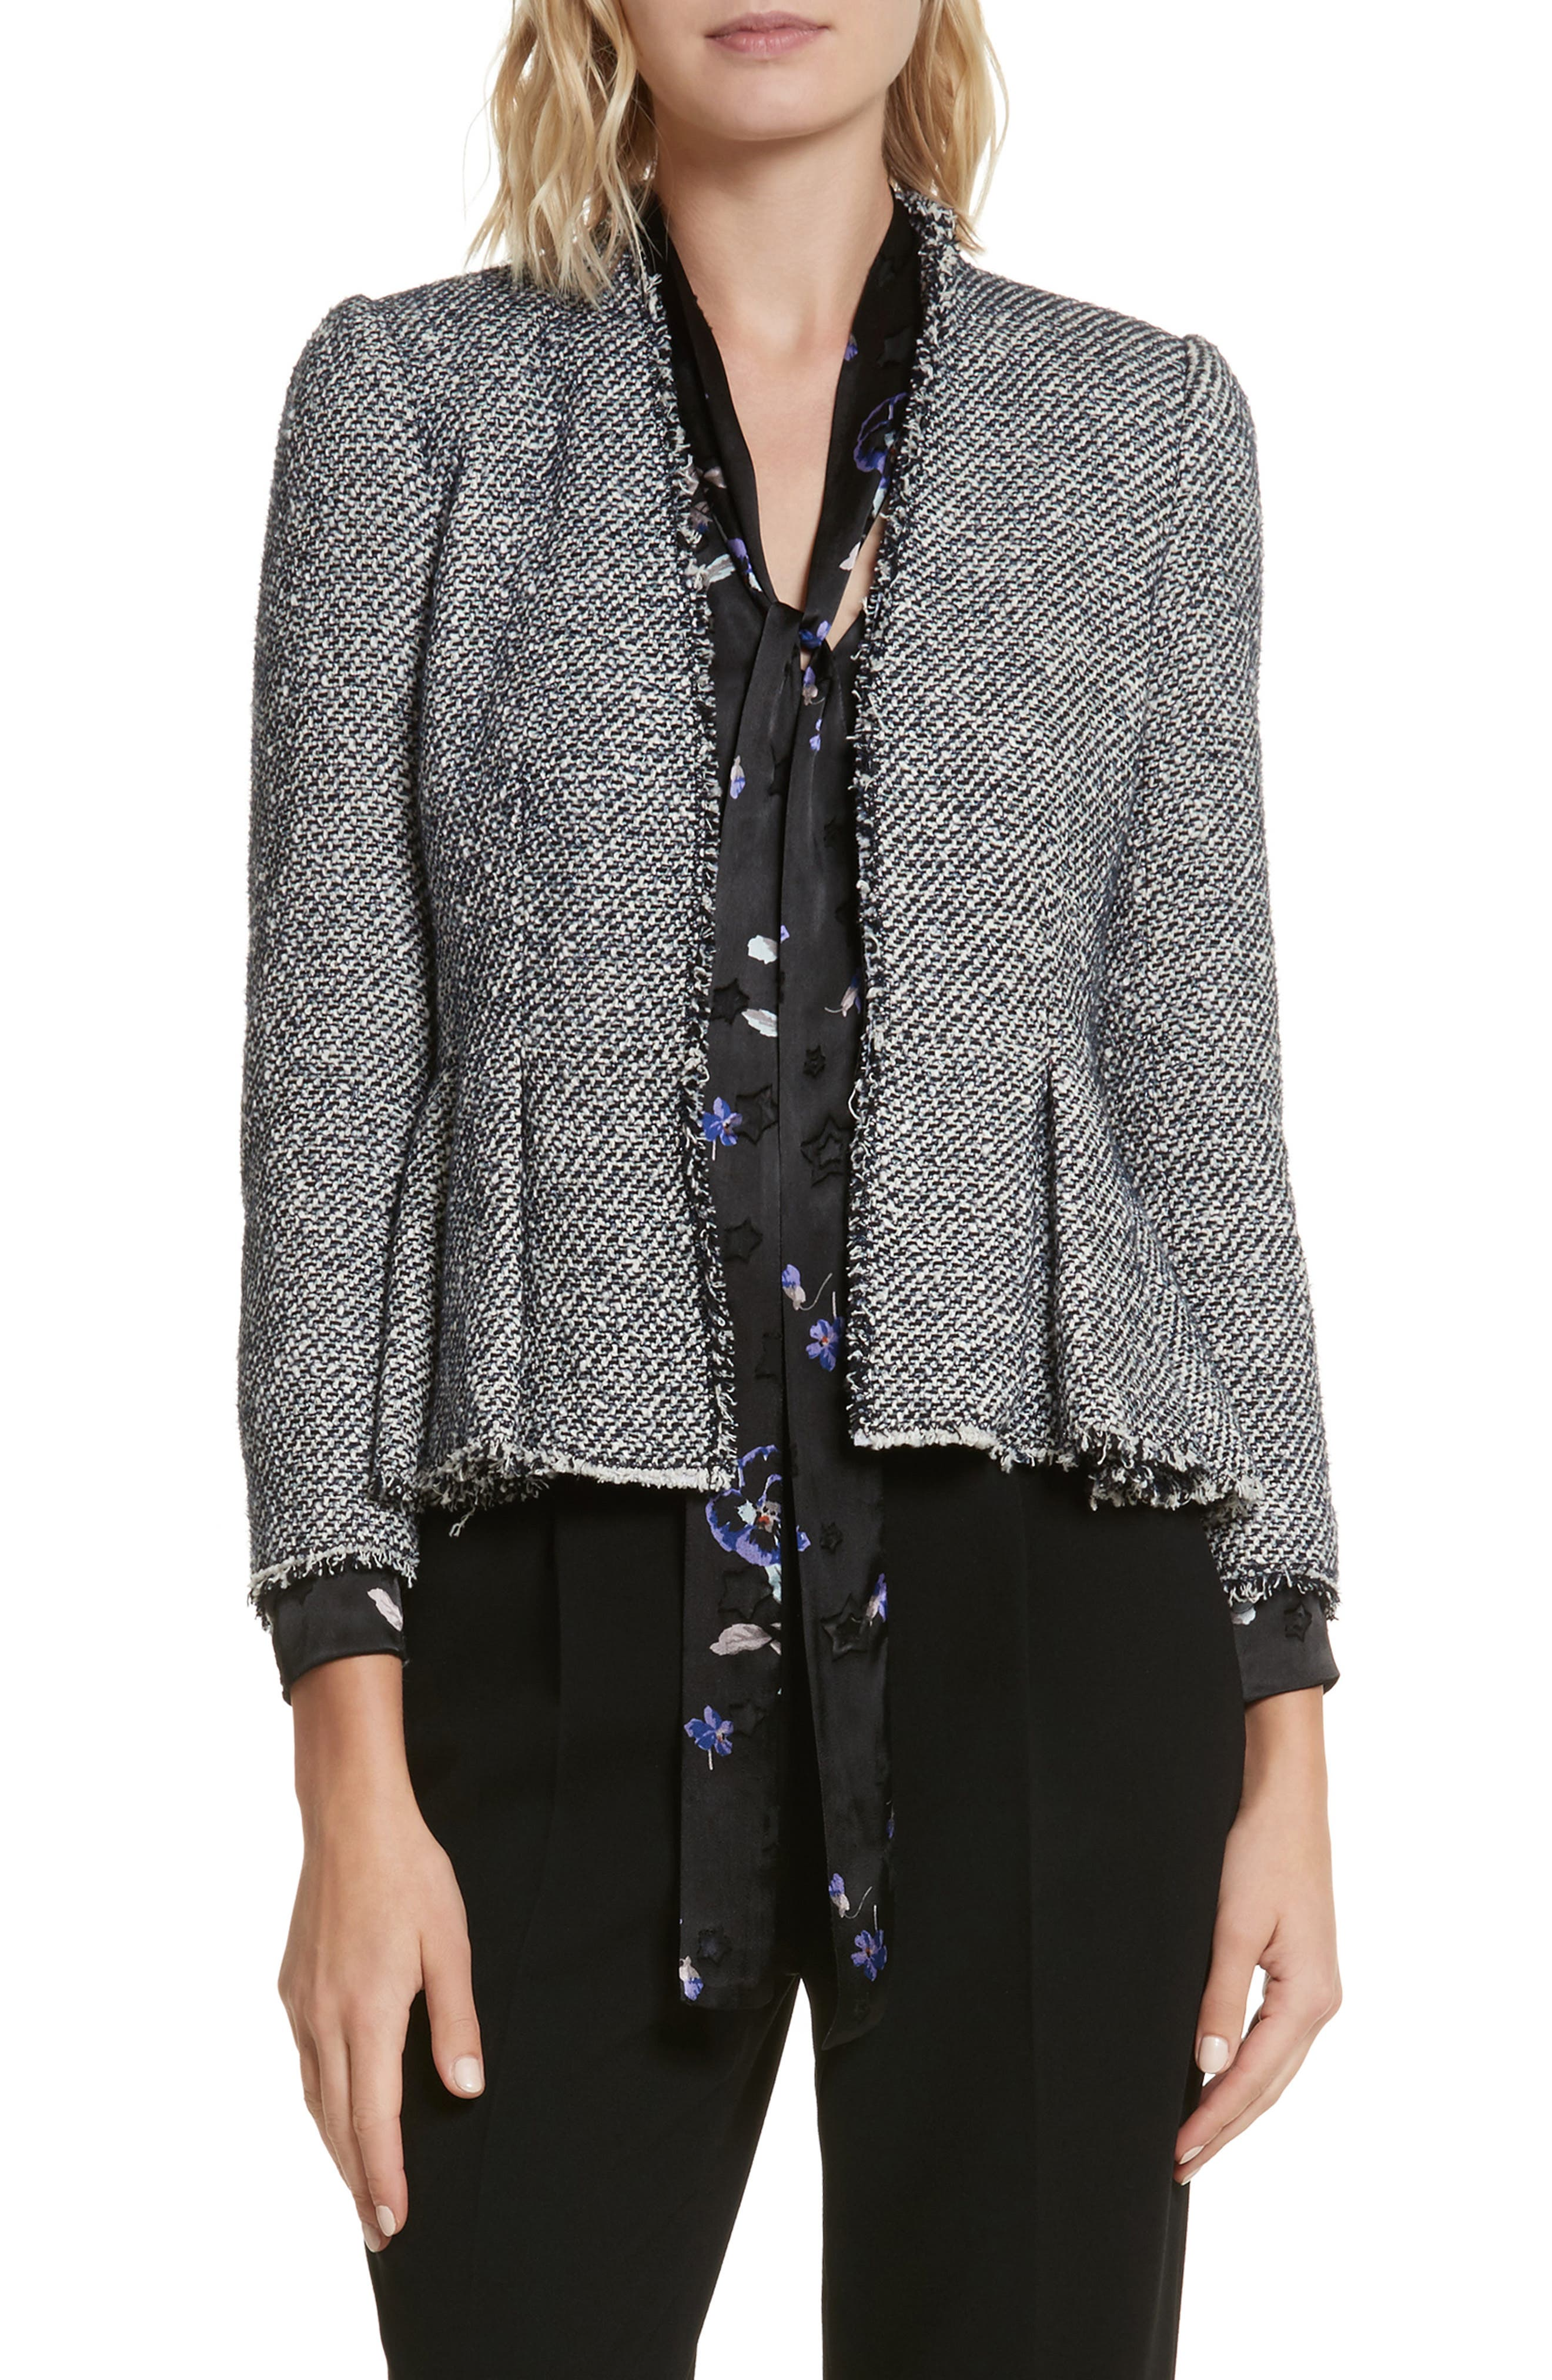 Alternate Image 1 Selected - Rebecca Taylor Metallic Tweed Jacket